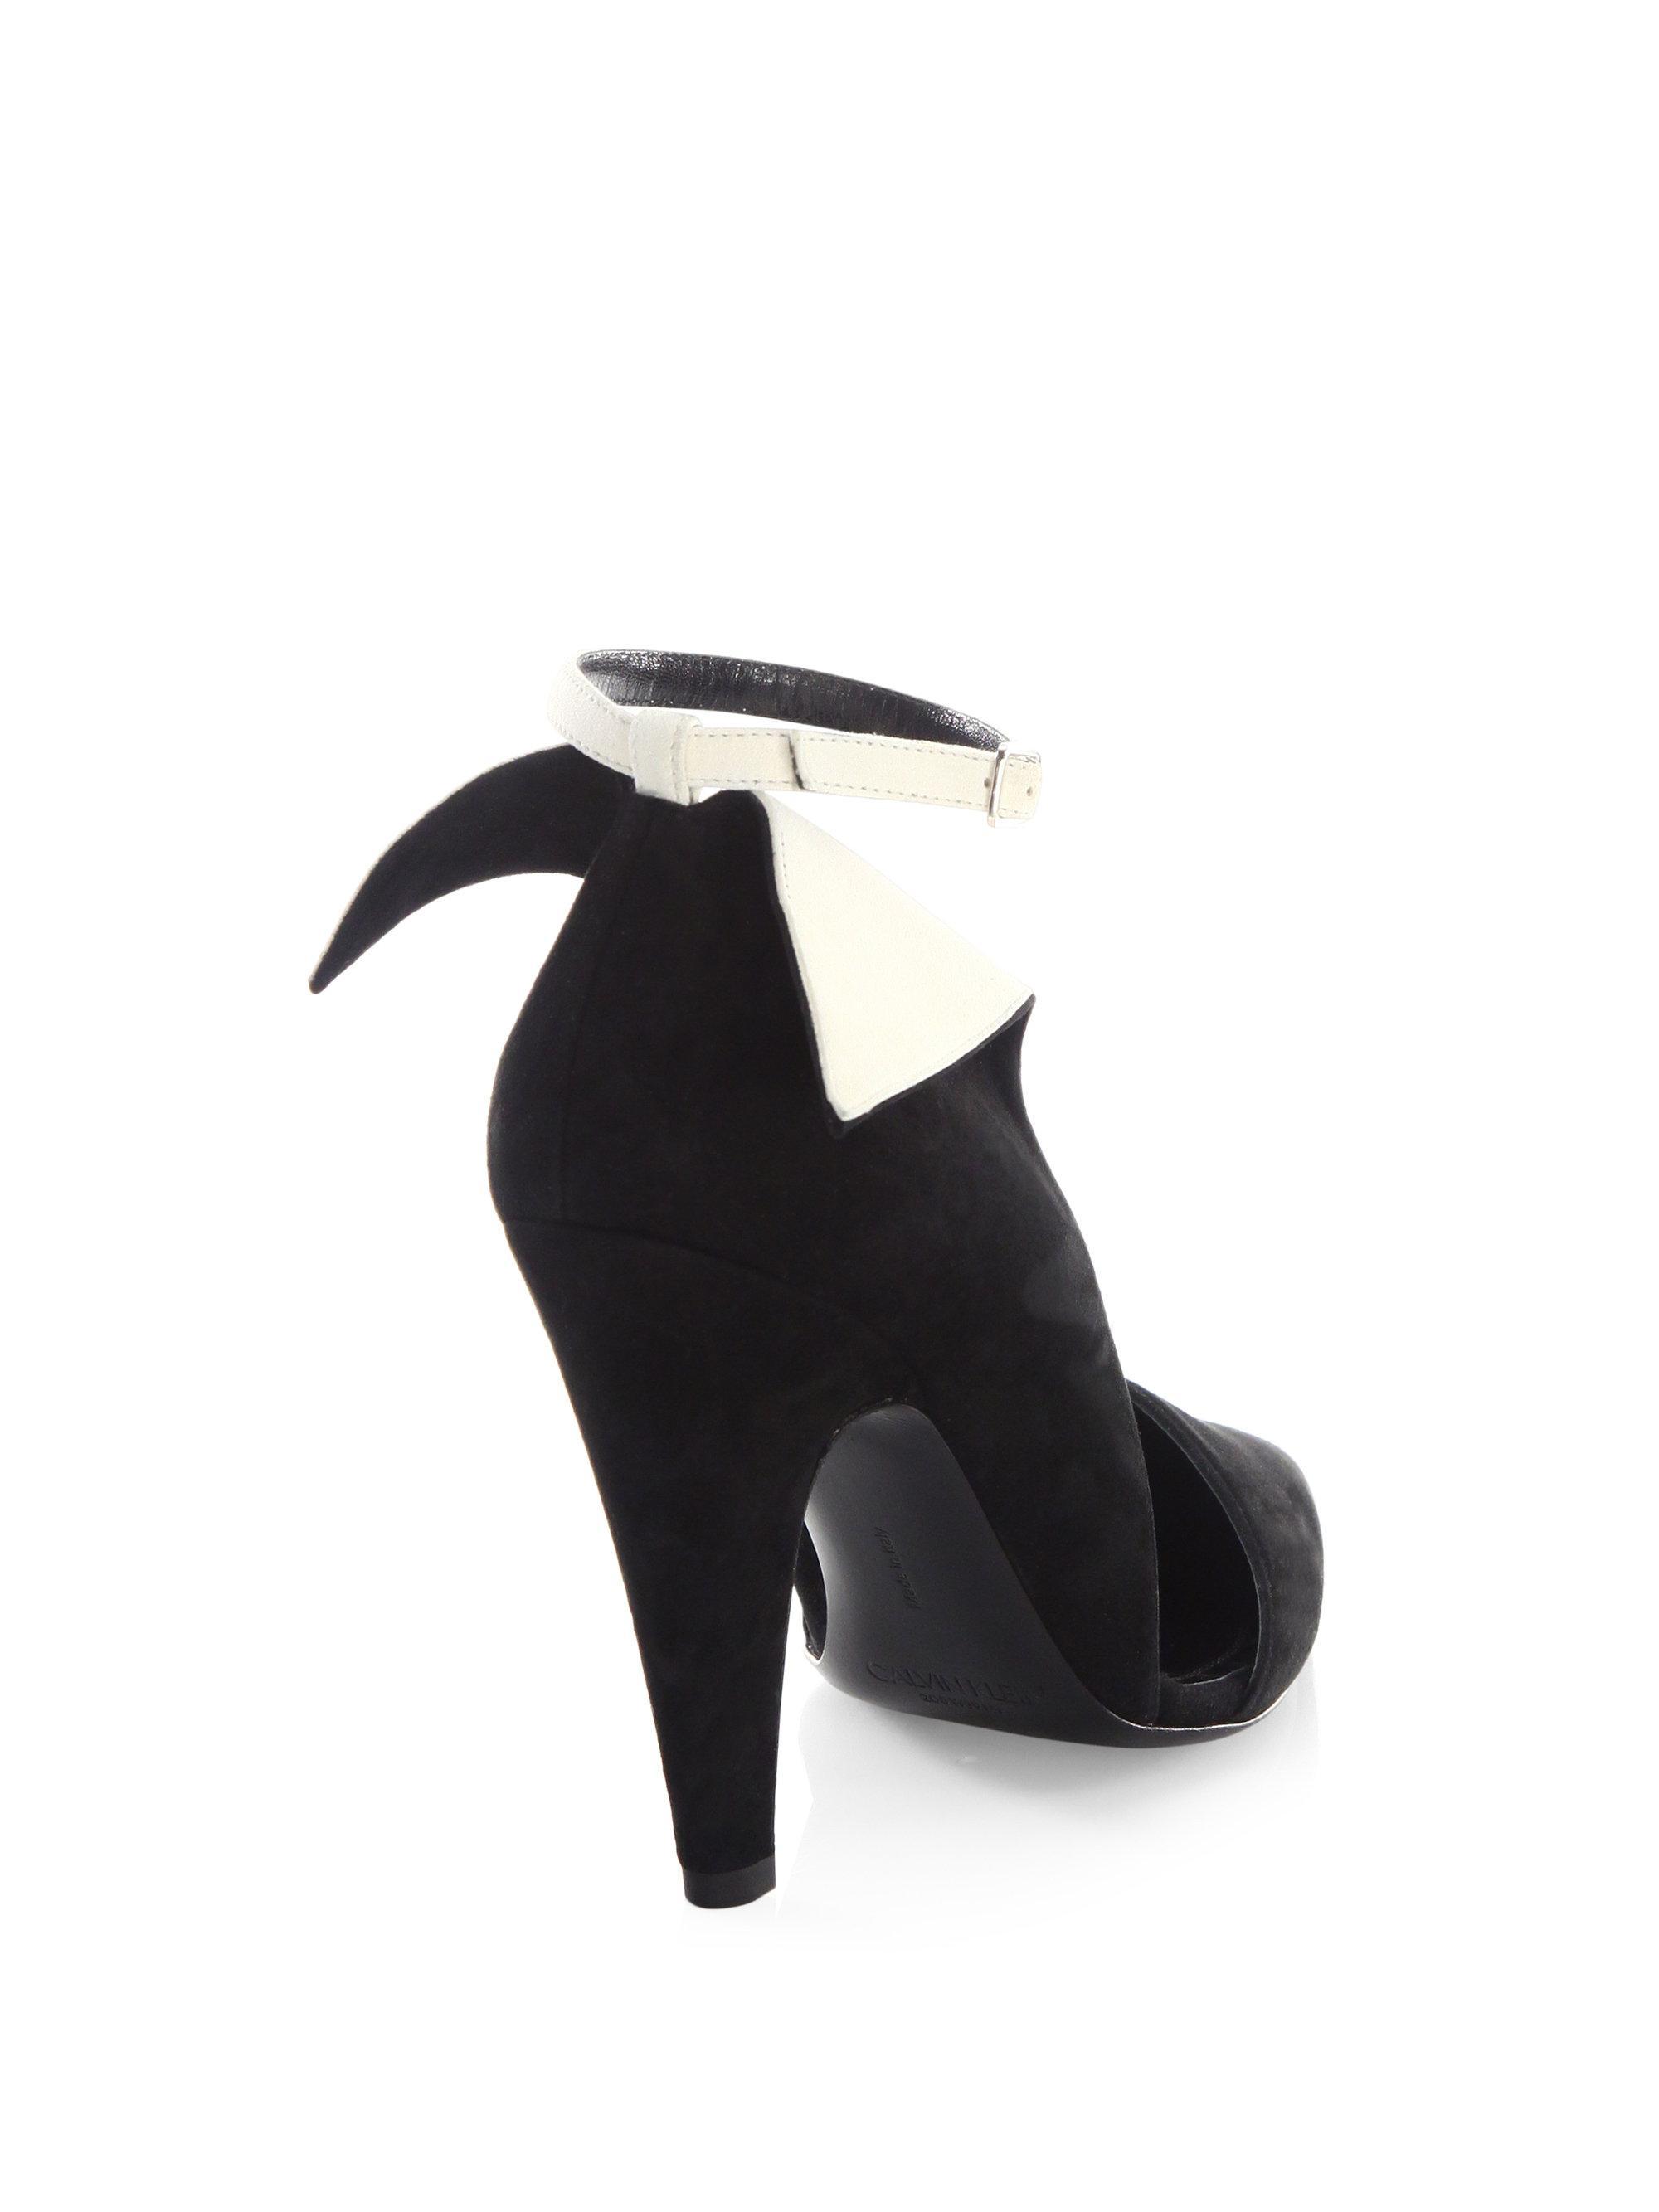 Womens Kaiya Suede Ankle-Strap Pumps CALVIN KLEIN 205W39NYC Cheap Discount Sale G4UPaz0U8x